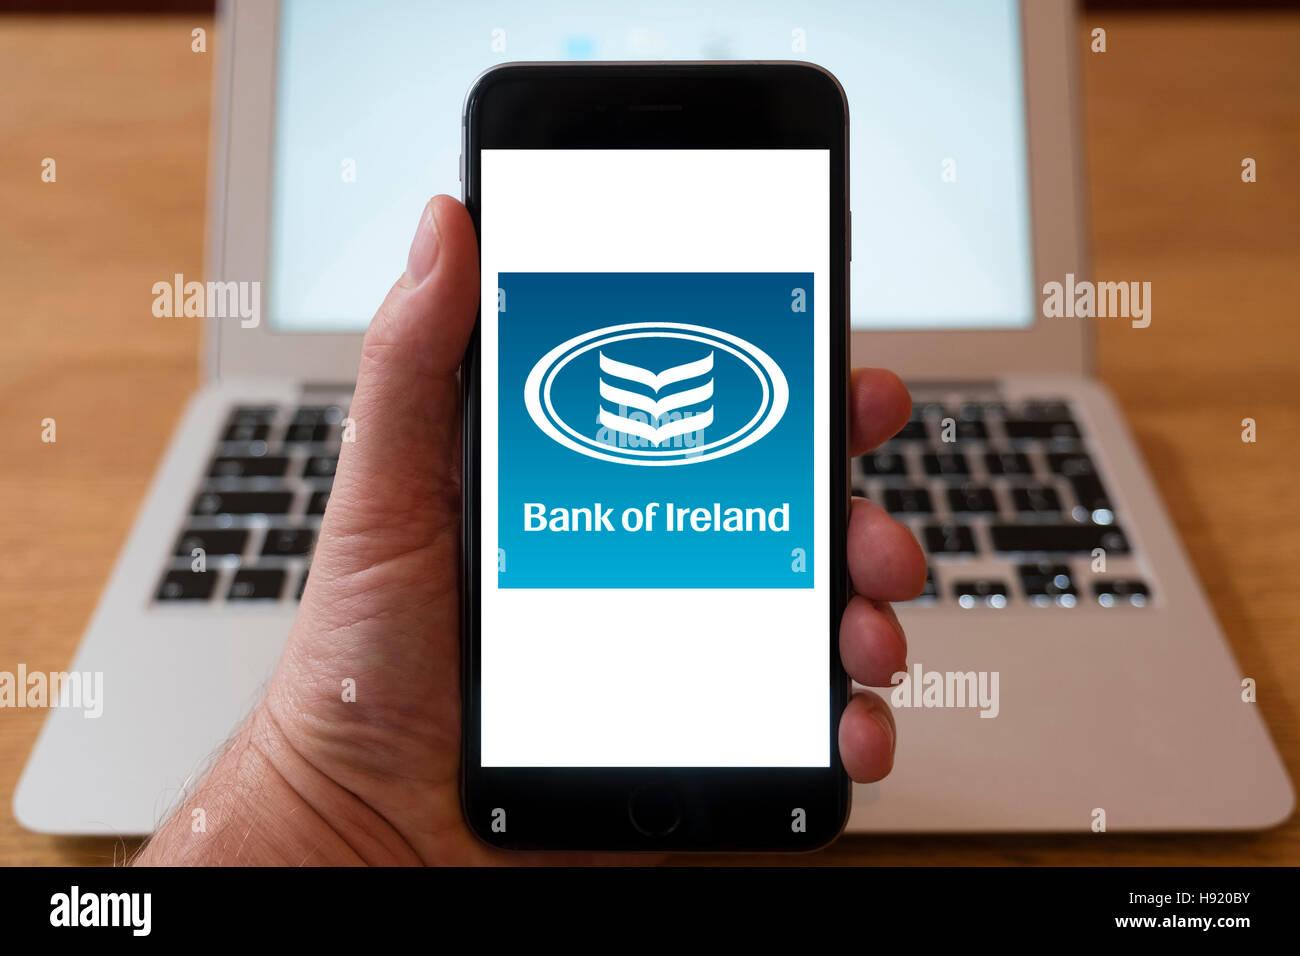 Using iPhone smart phone to display website logo of Bank of Ireland - Stock Image